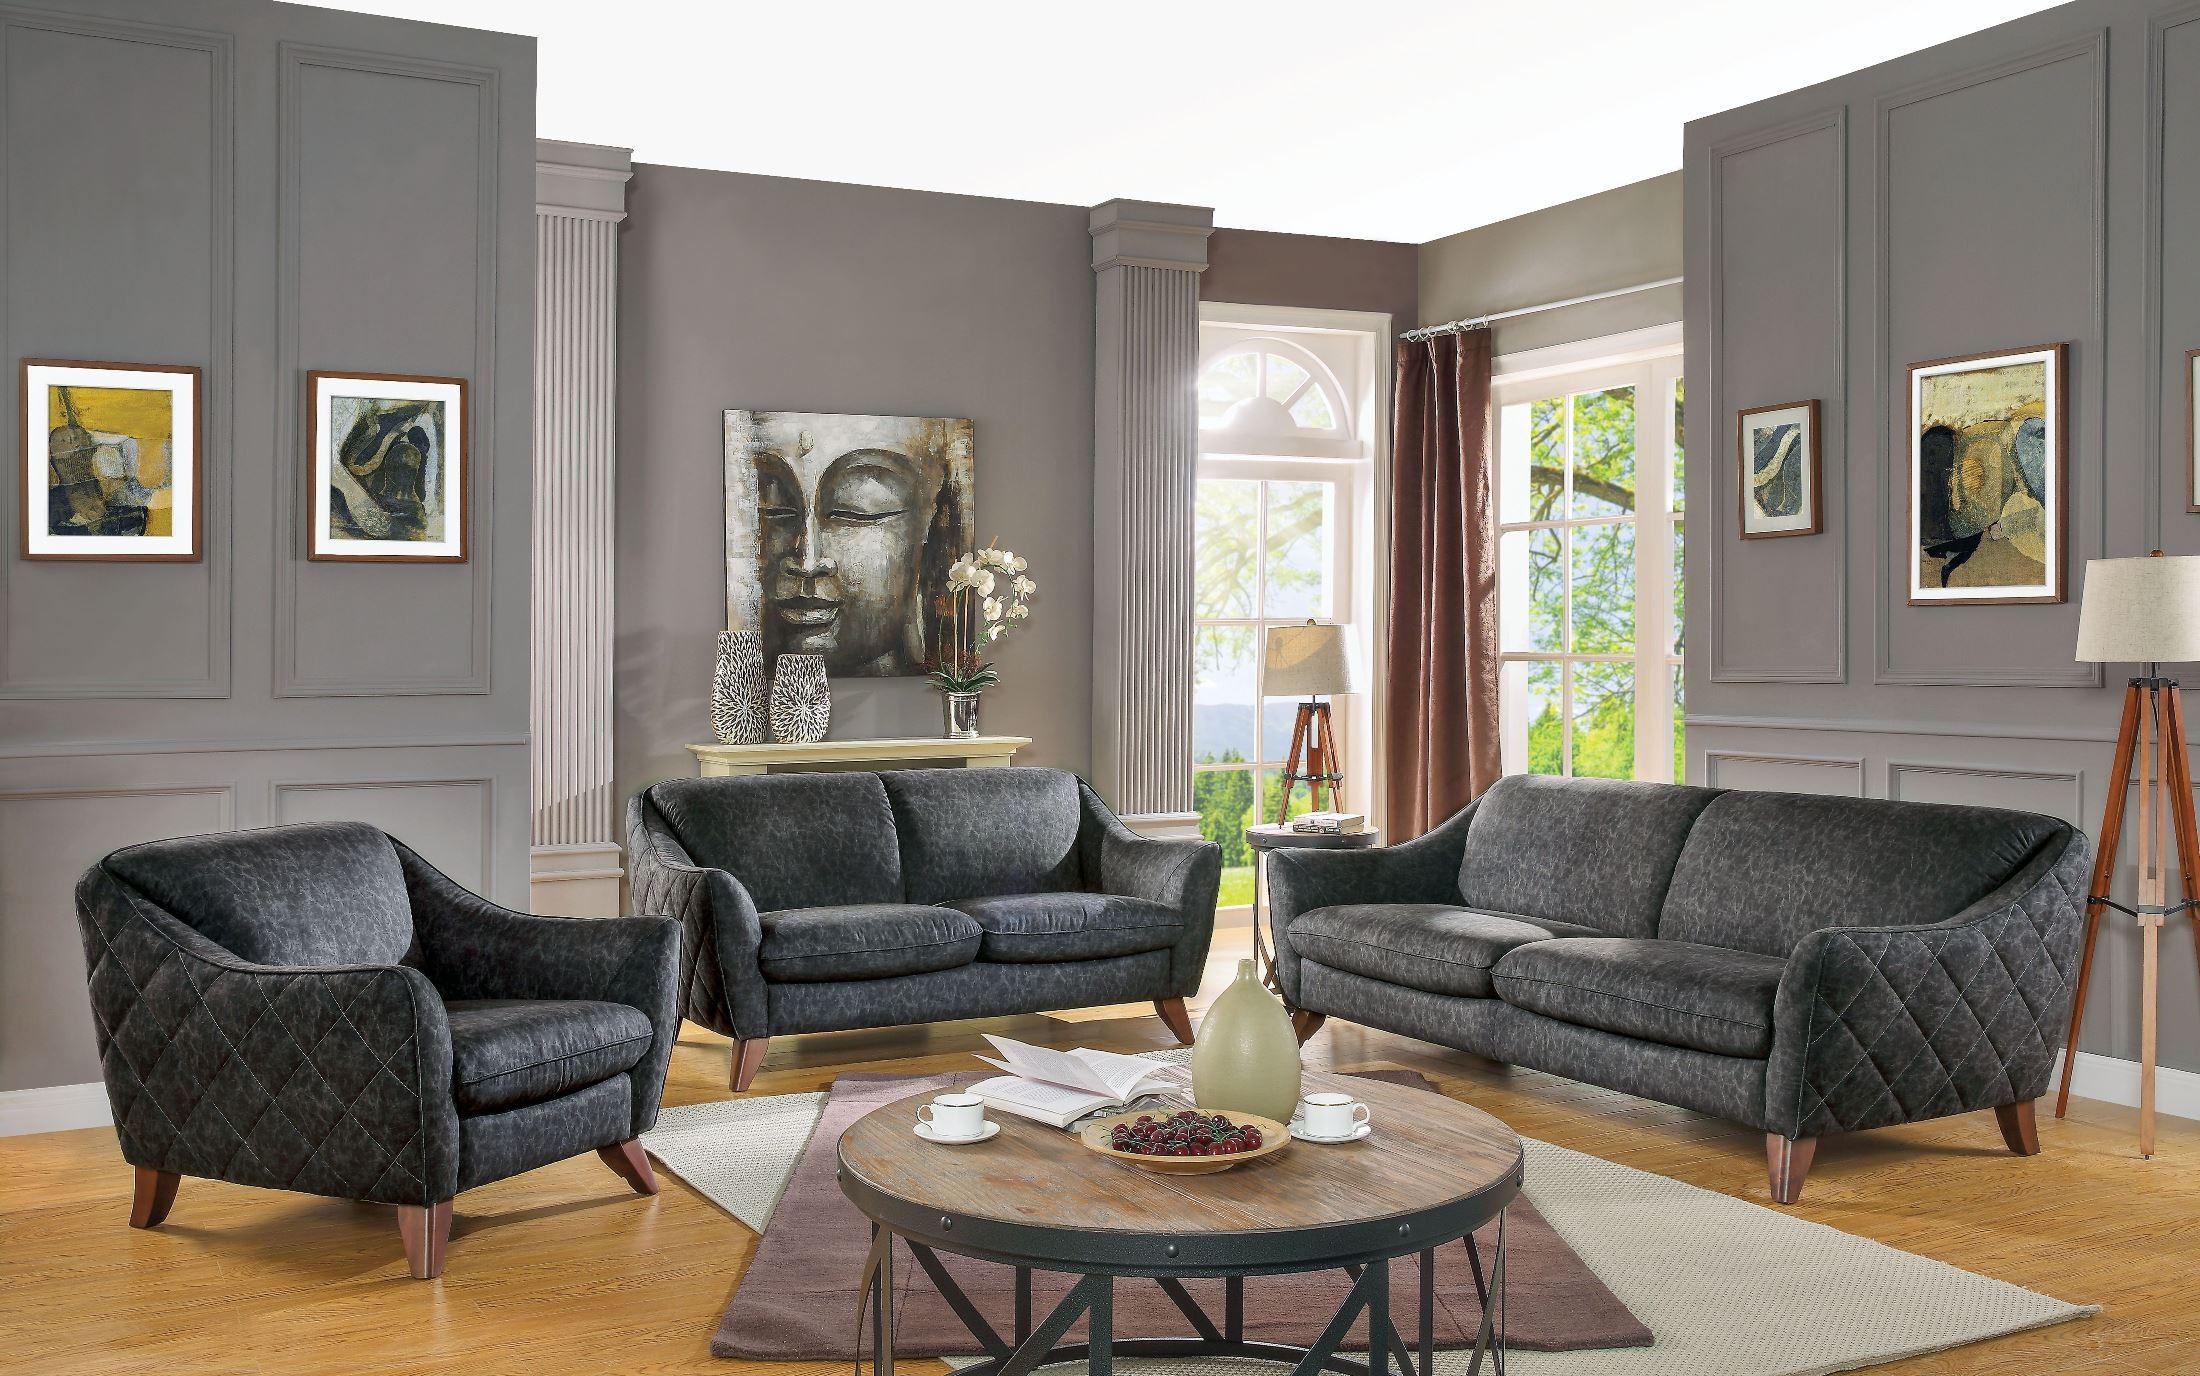 972fe6bcbf13 Acme Daffodil Vintage Living Room Set Daffodil Collection 4